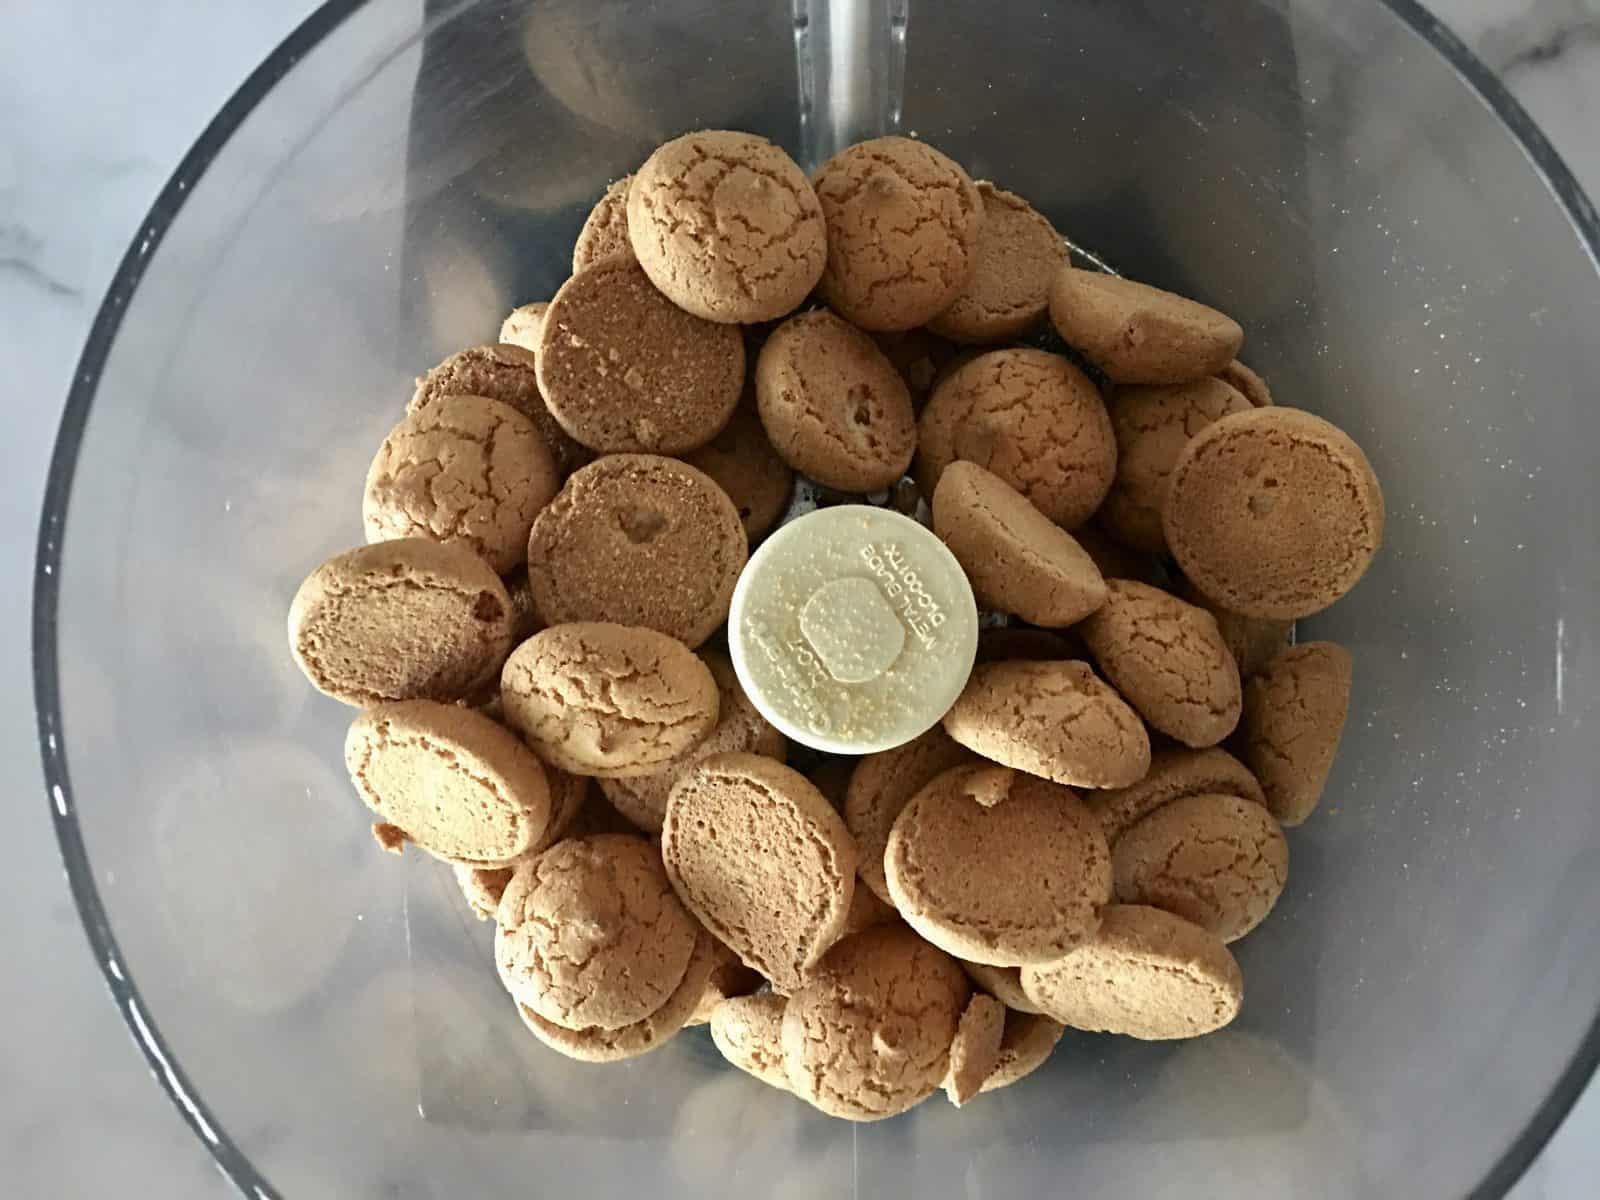 amaretti cookies in a food processor.